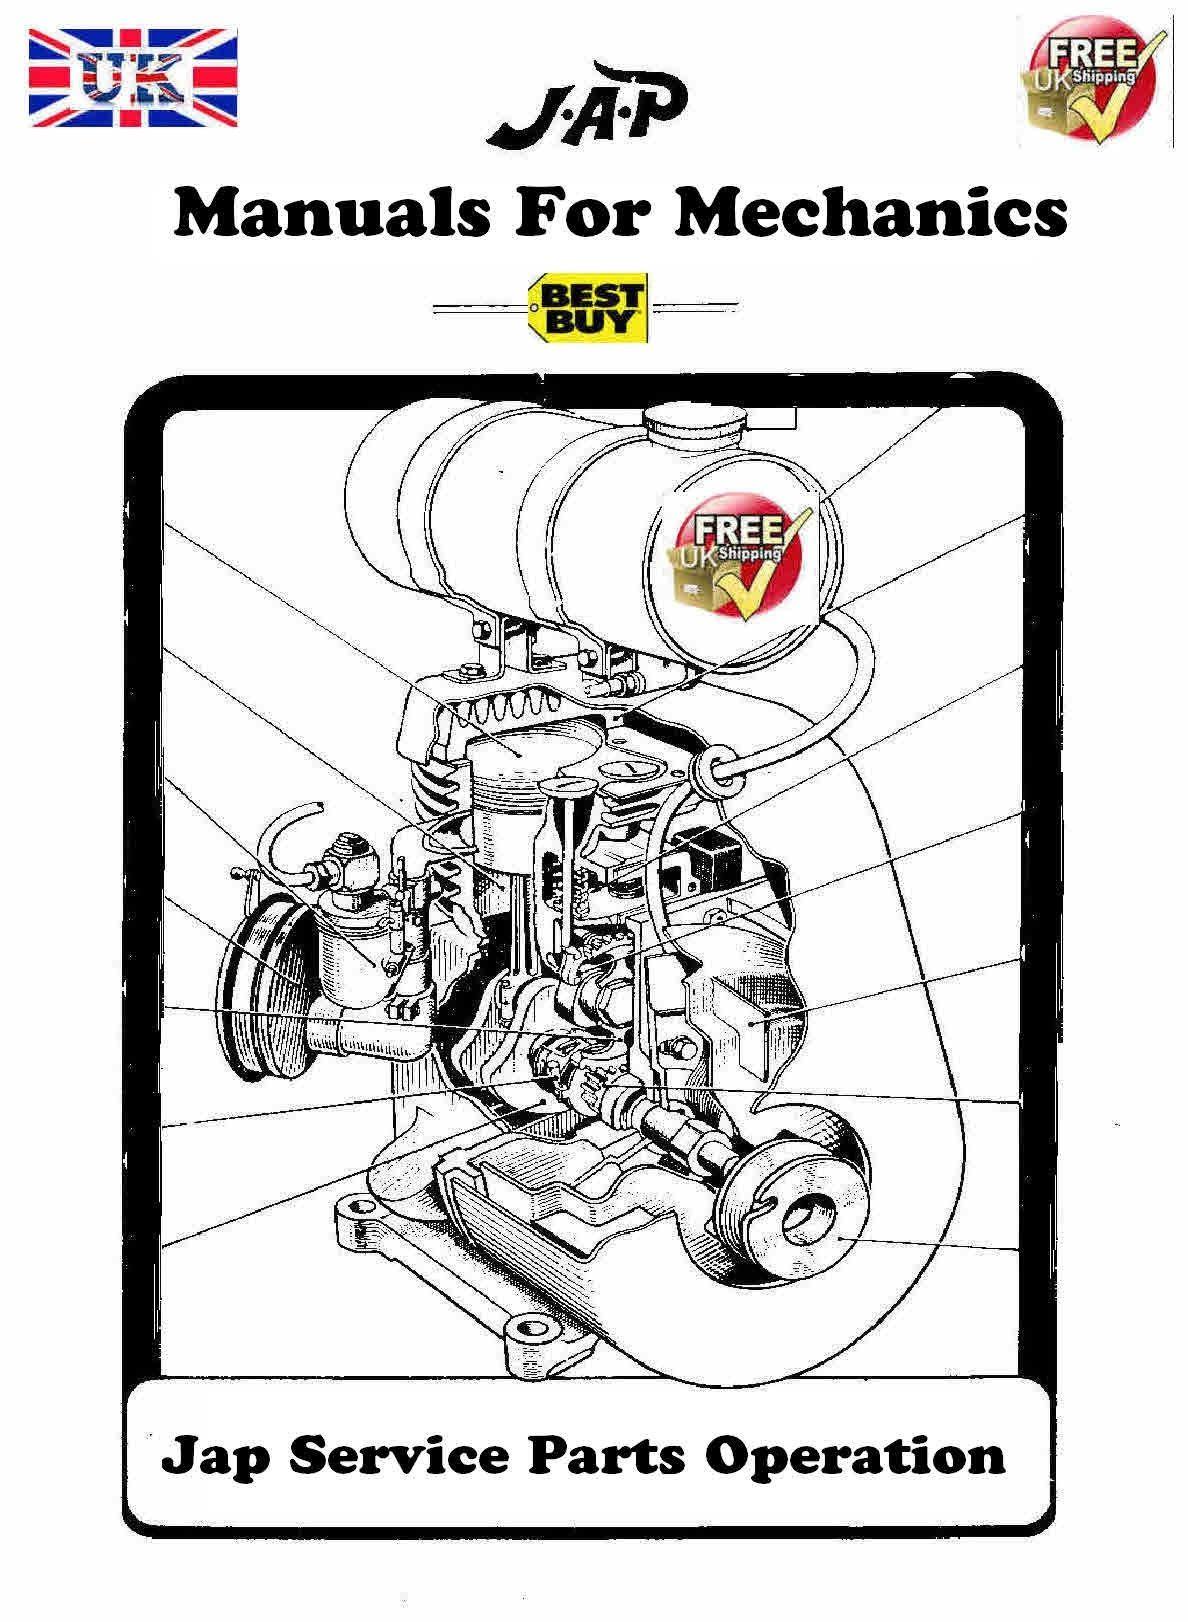 Jap Engine Manuals For Mechanics